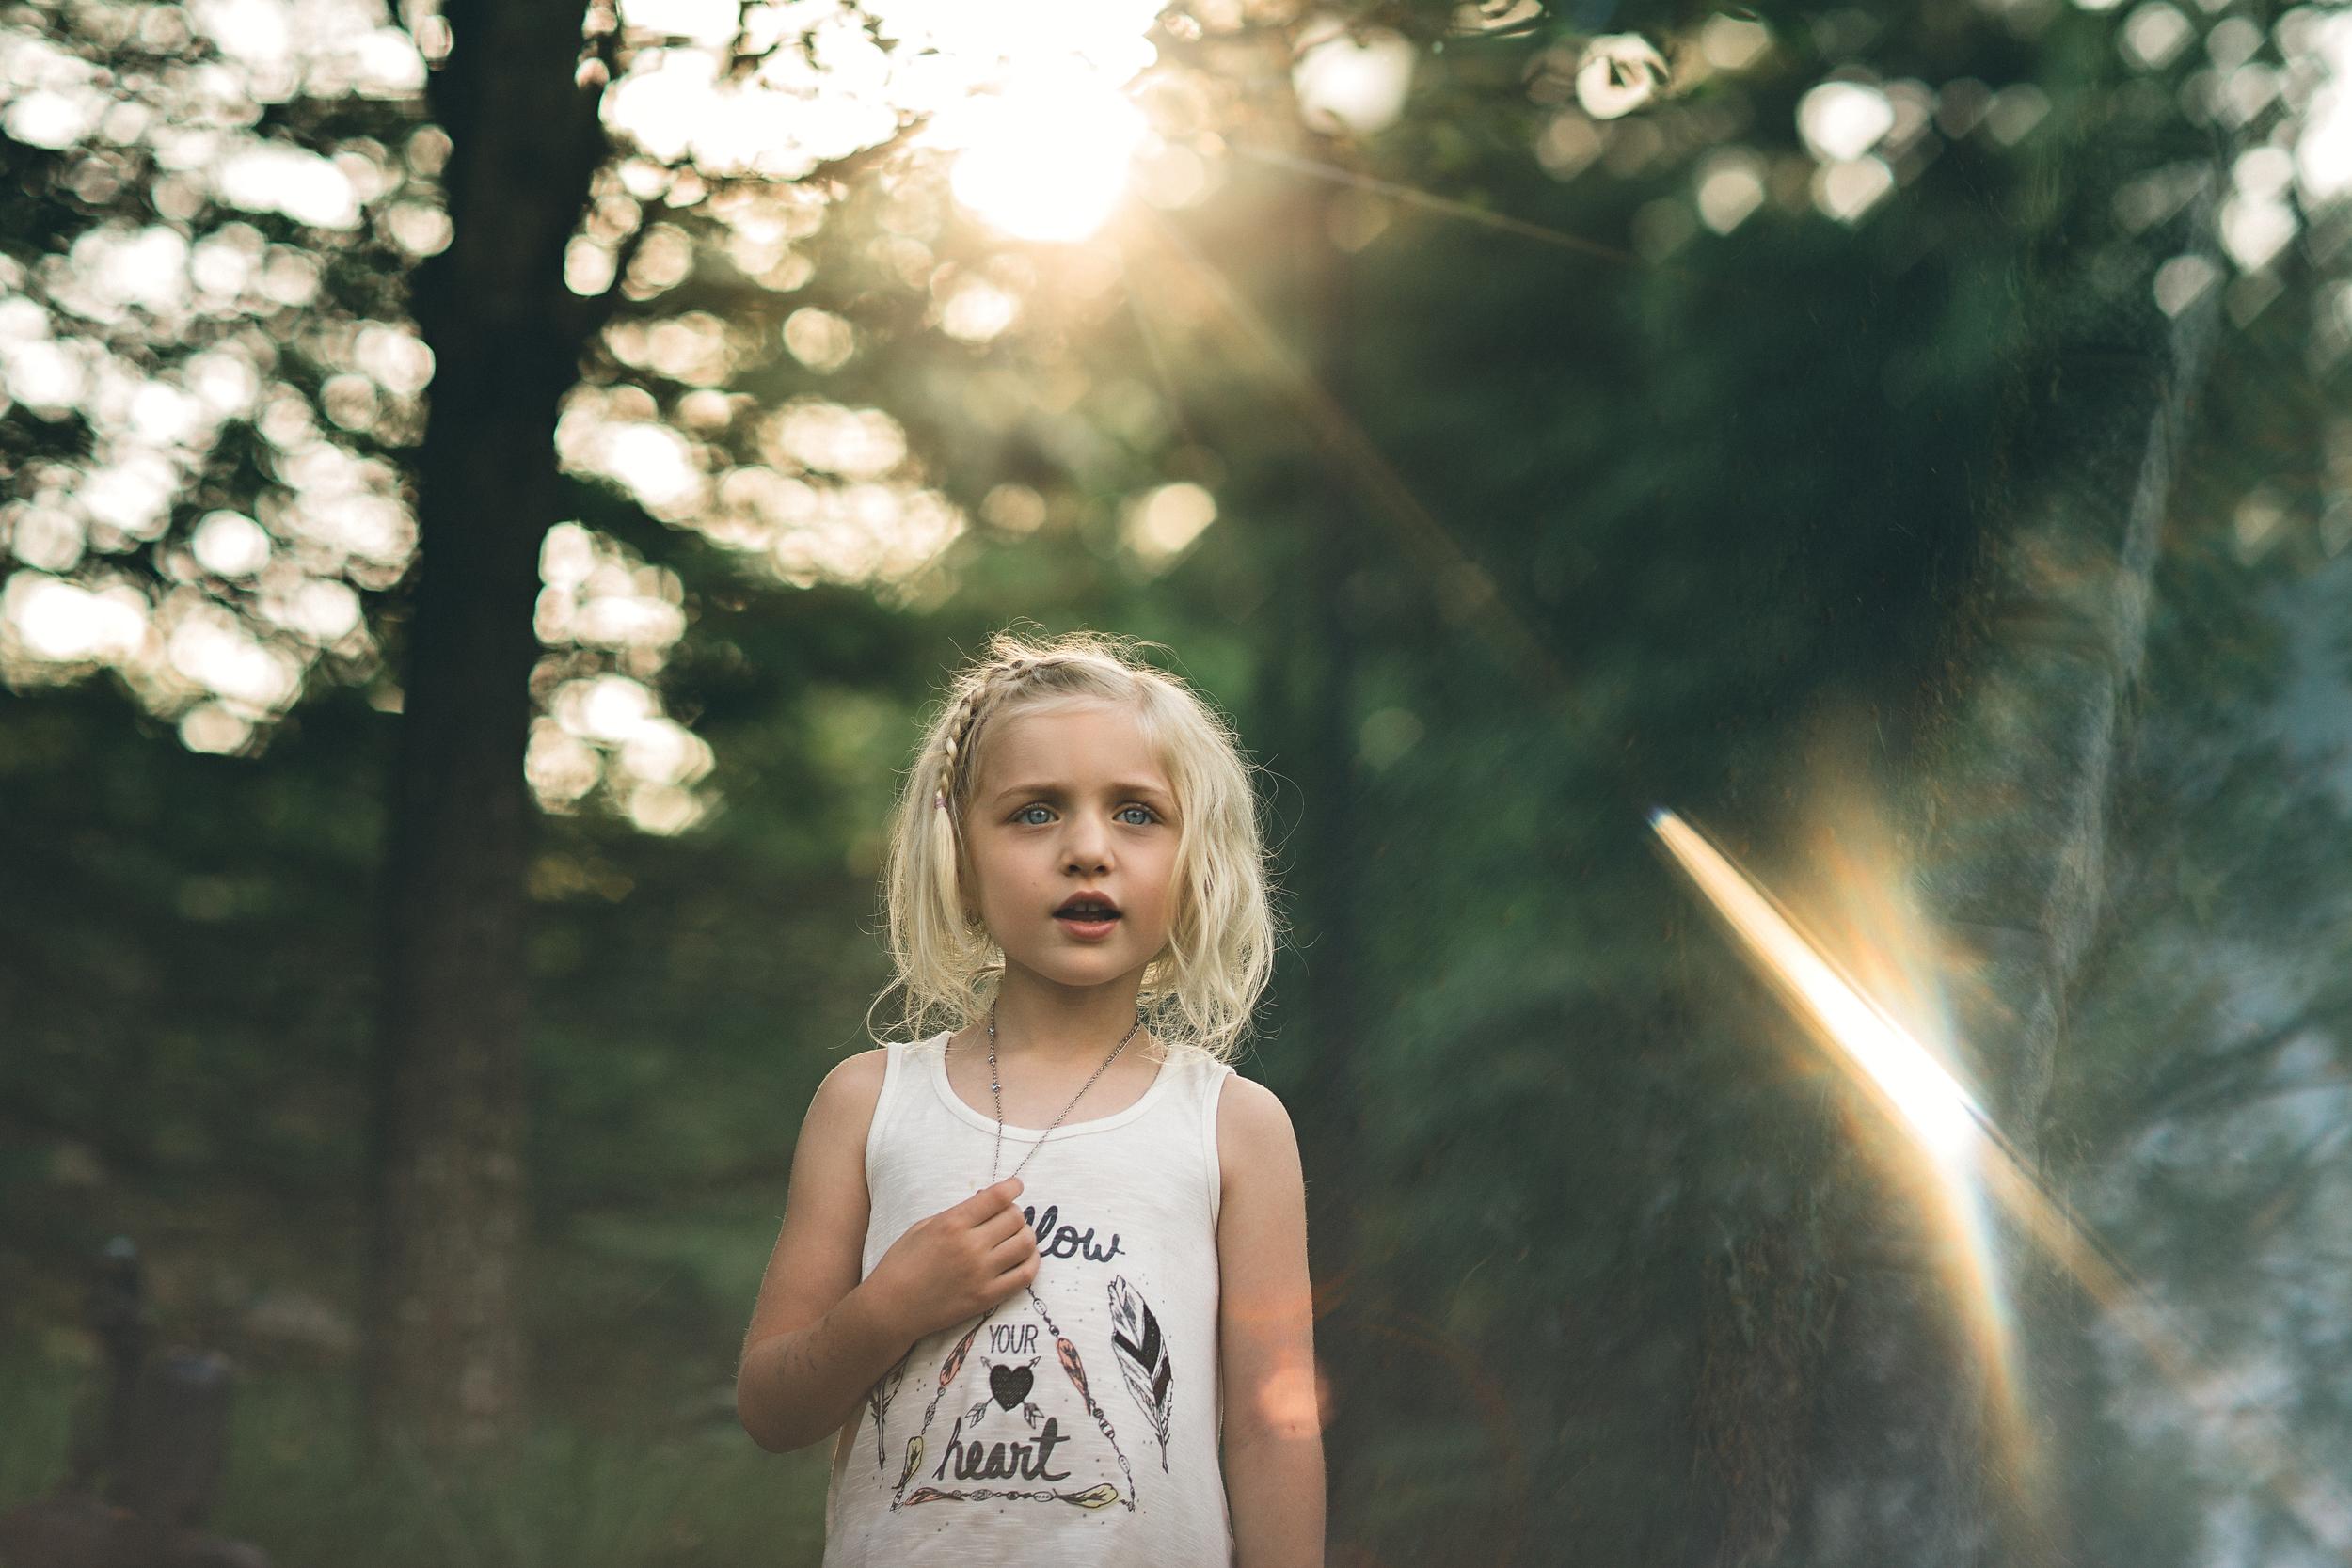 hello-olivia-photography-long-island-family-child-kids-lifestyle-portrait-photographer-prism-toddler-girl-necklace-blonde.jpg